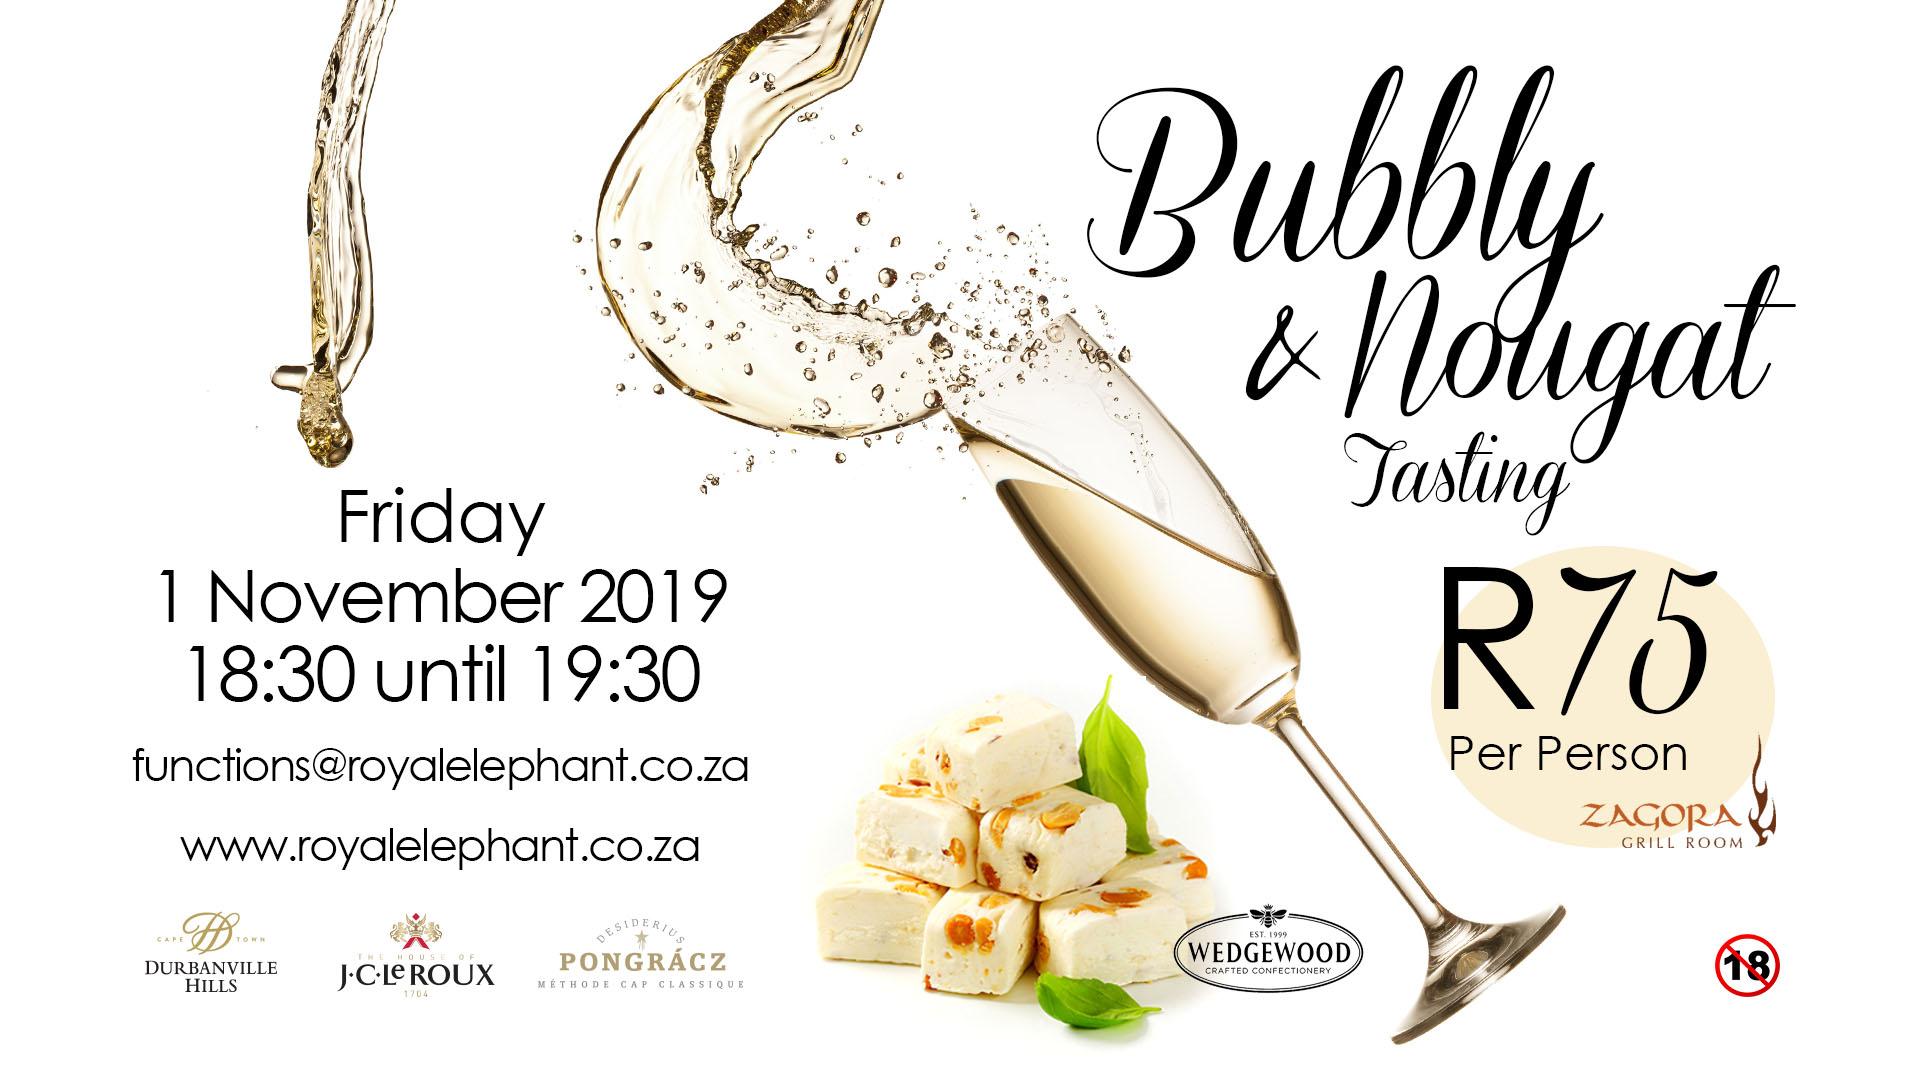 Bubbly & Nougat Tasting – 1 November 2019